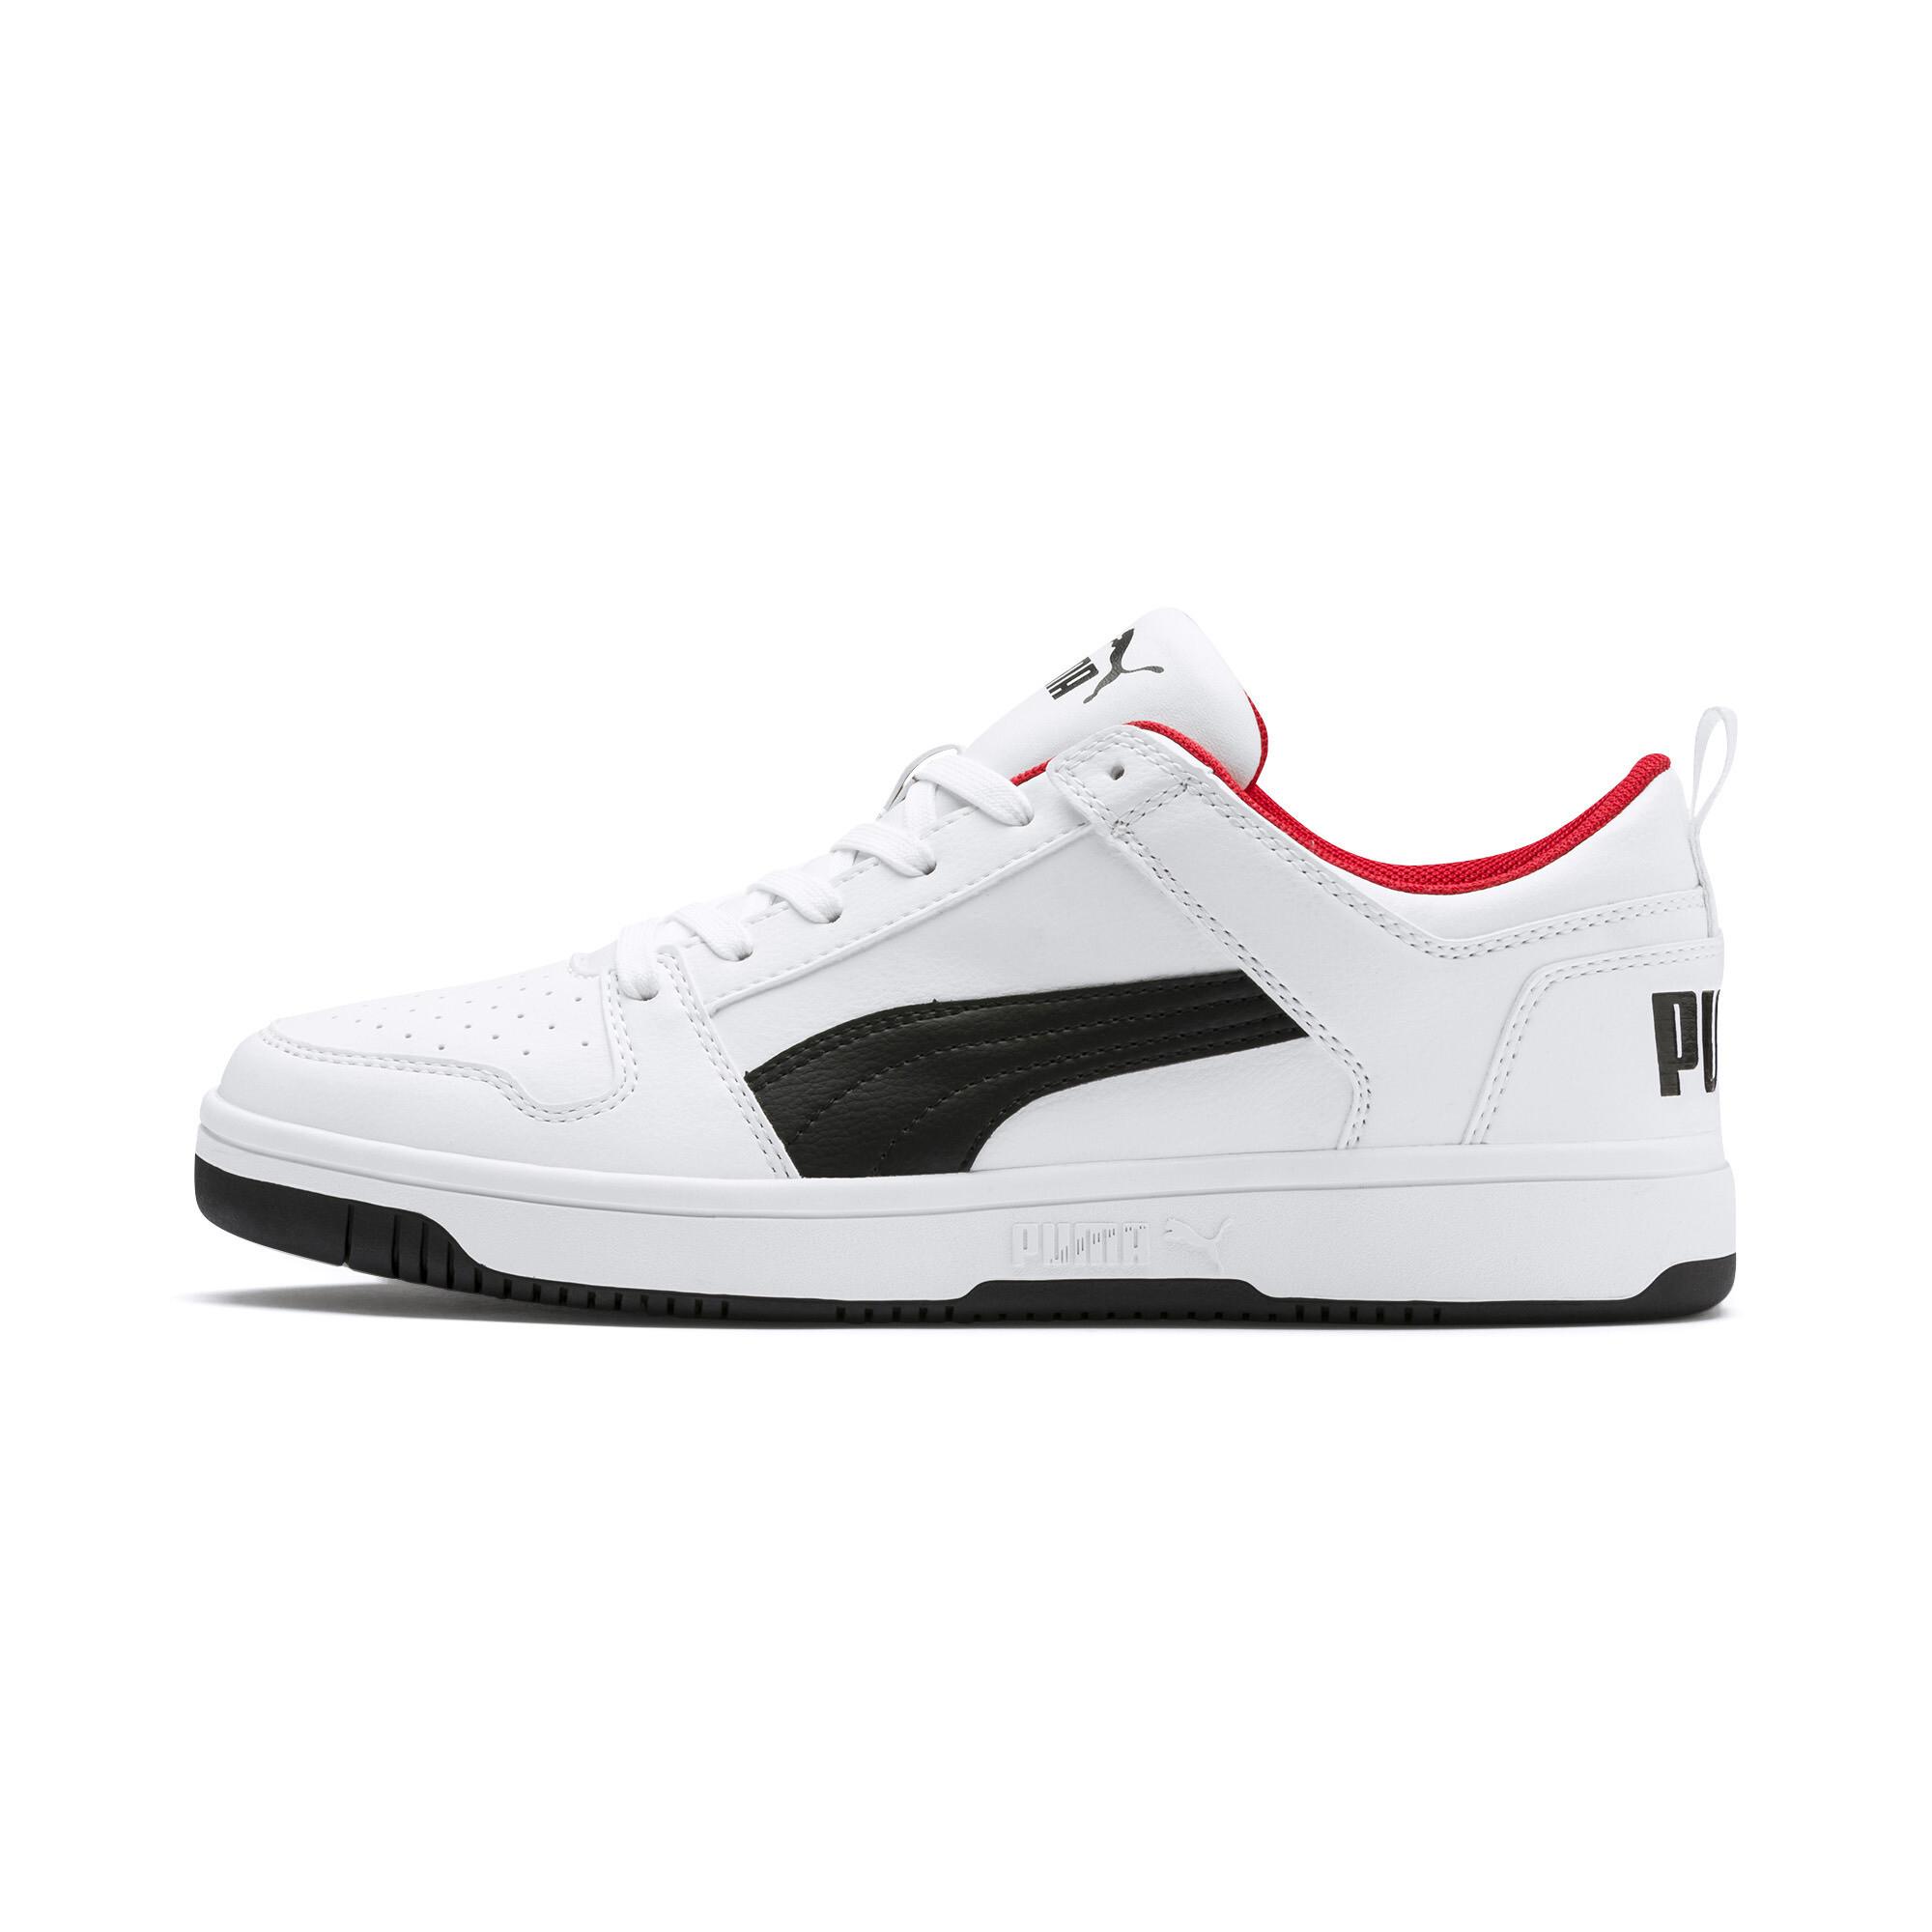 PUMA-PUMA-Rebound-LayUp-Lo-Men-039-s-Sneakers-Men-Shoe-Basics miniatura 13